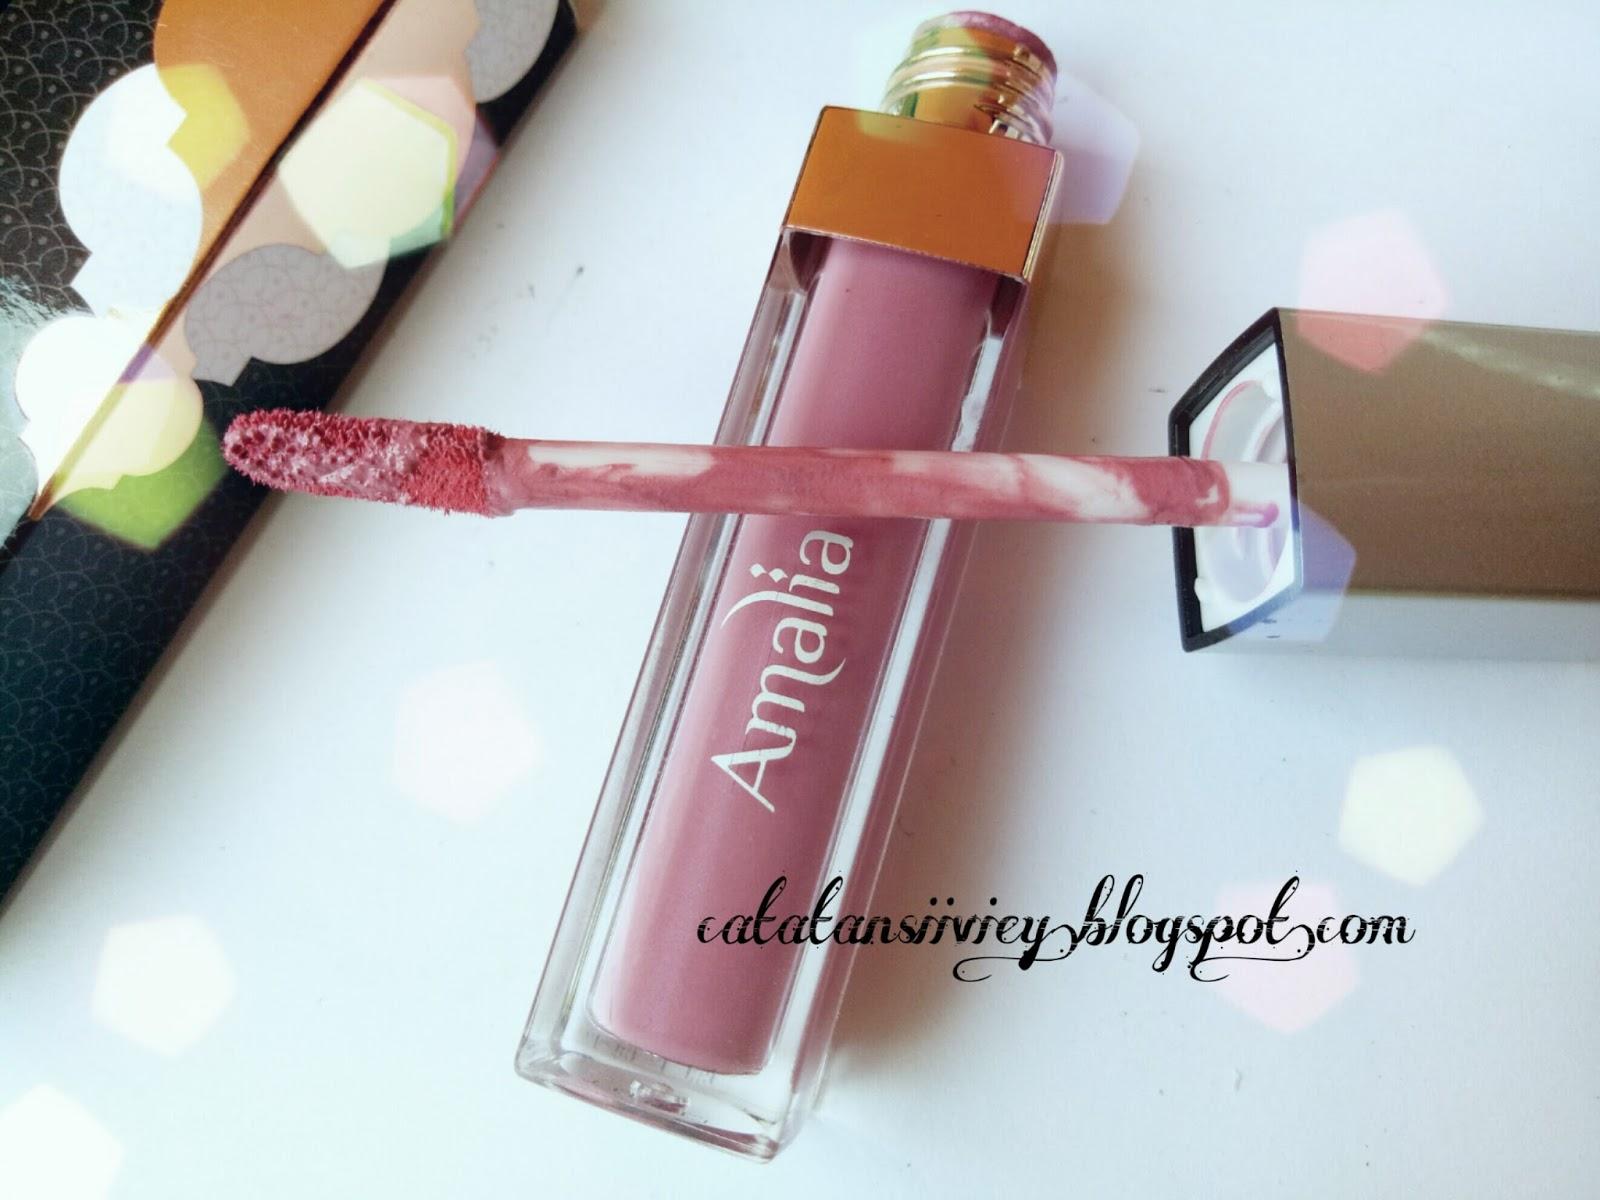 Review Amalia Matte Lipcream Marocco Pink 03 Cosmetics Lip Cream Morocco Nude Secara Packagingamalia Ini Di Kemas Dengan Botol Berbahan Plastik Kokoh Berwarna Bening Penutup Silver Dan Bagian Aplikator Nya